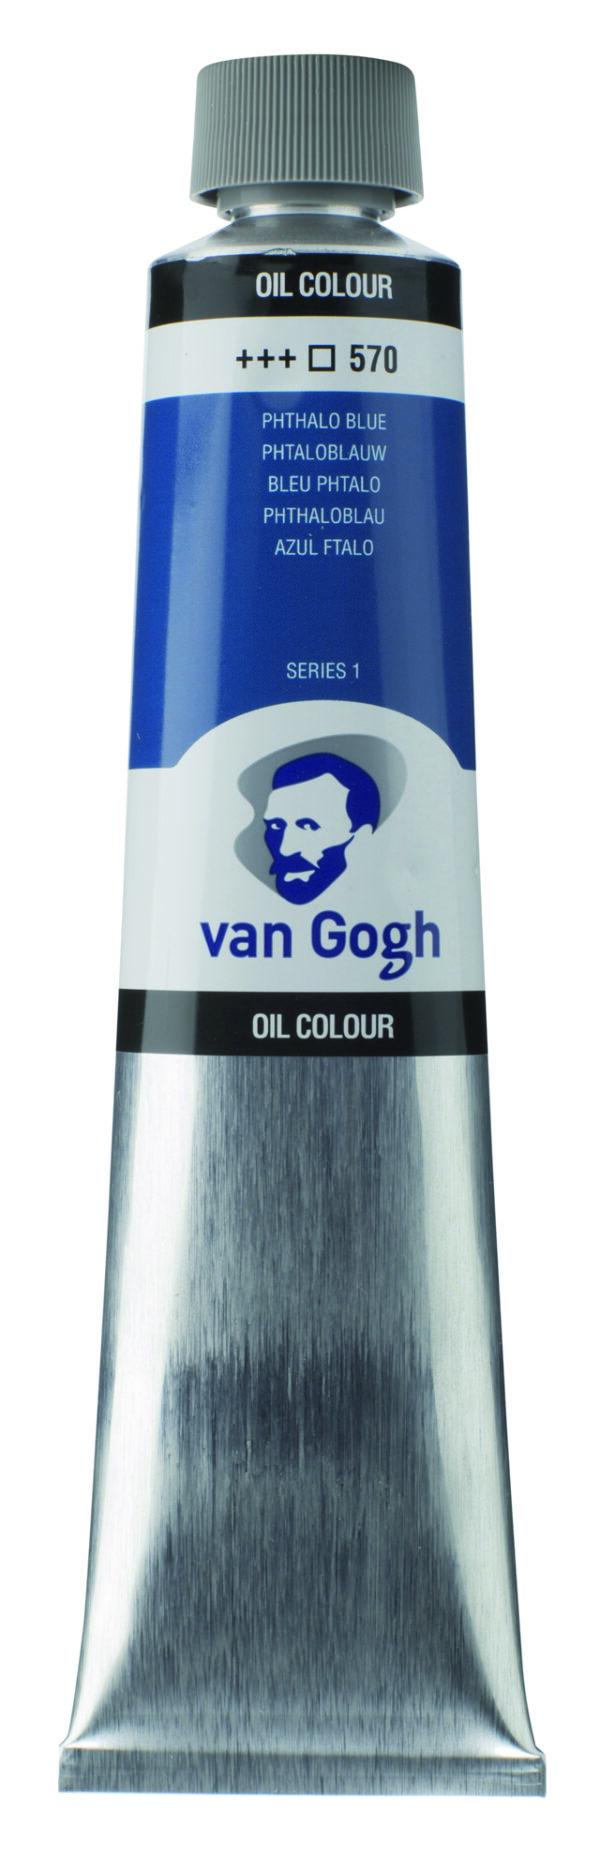 Van Gogh 570 Phthalo blue - 200 ml